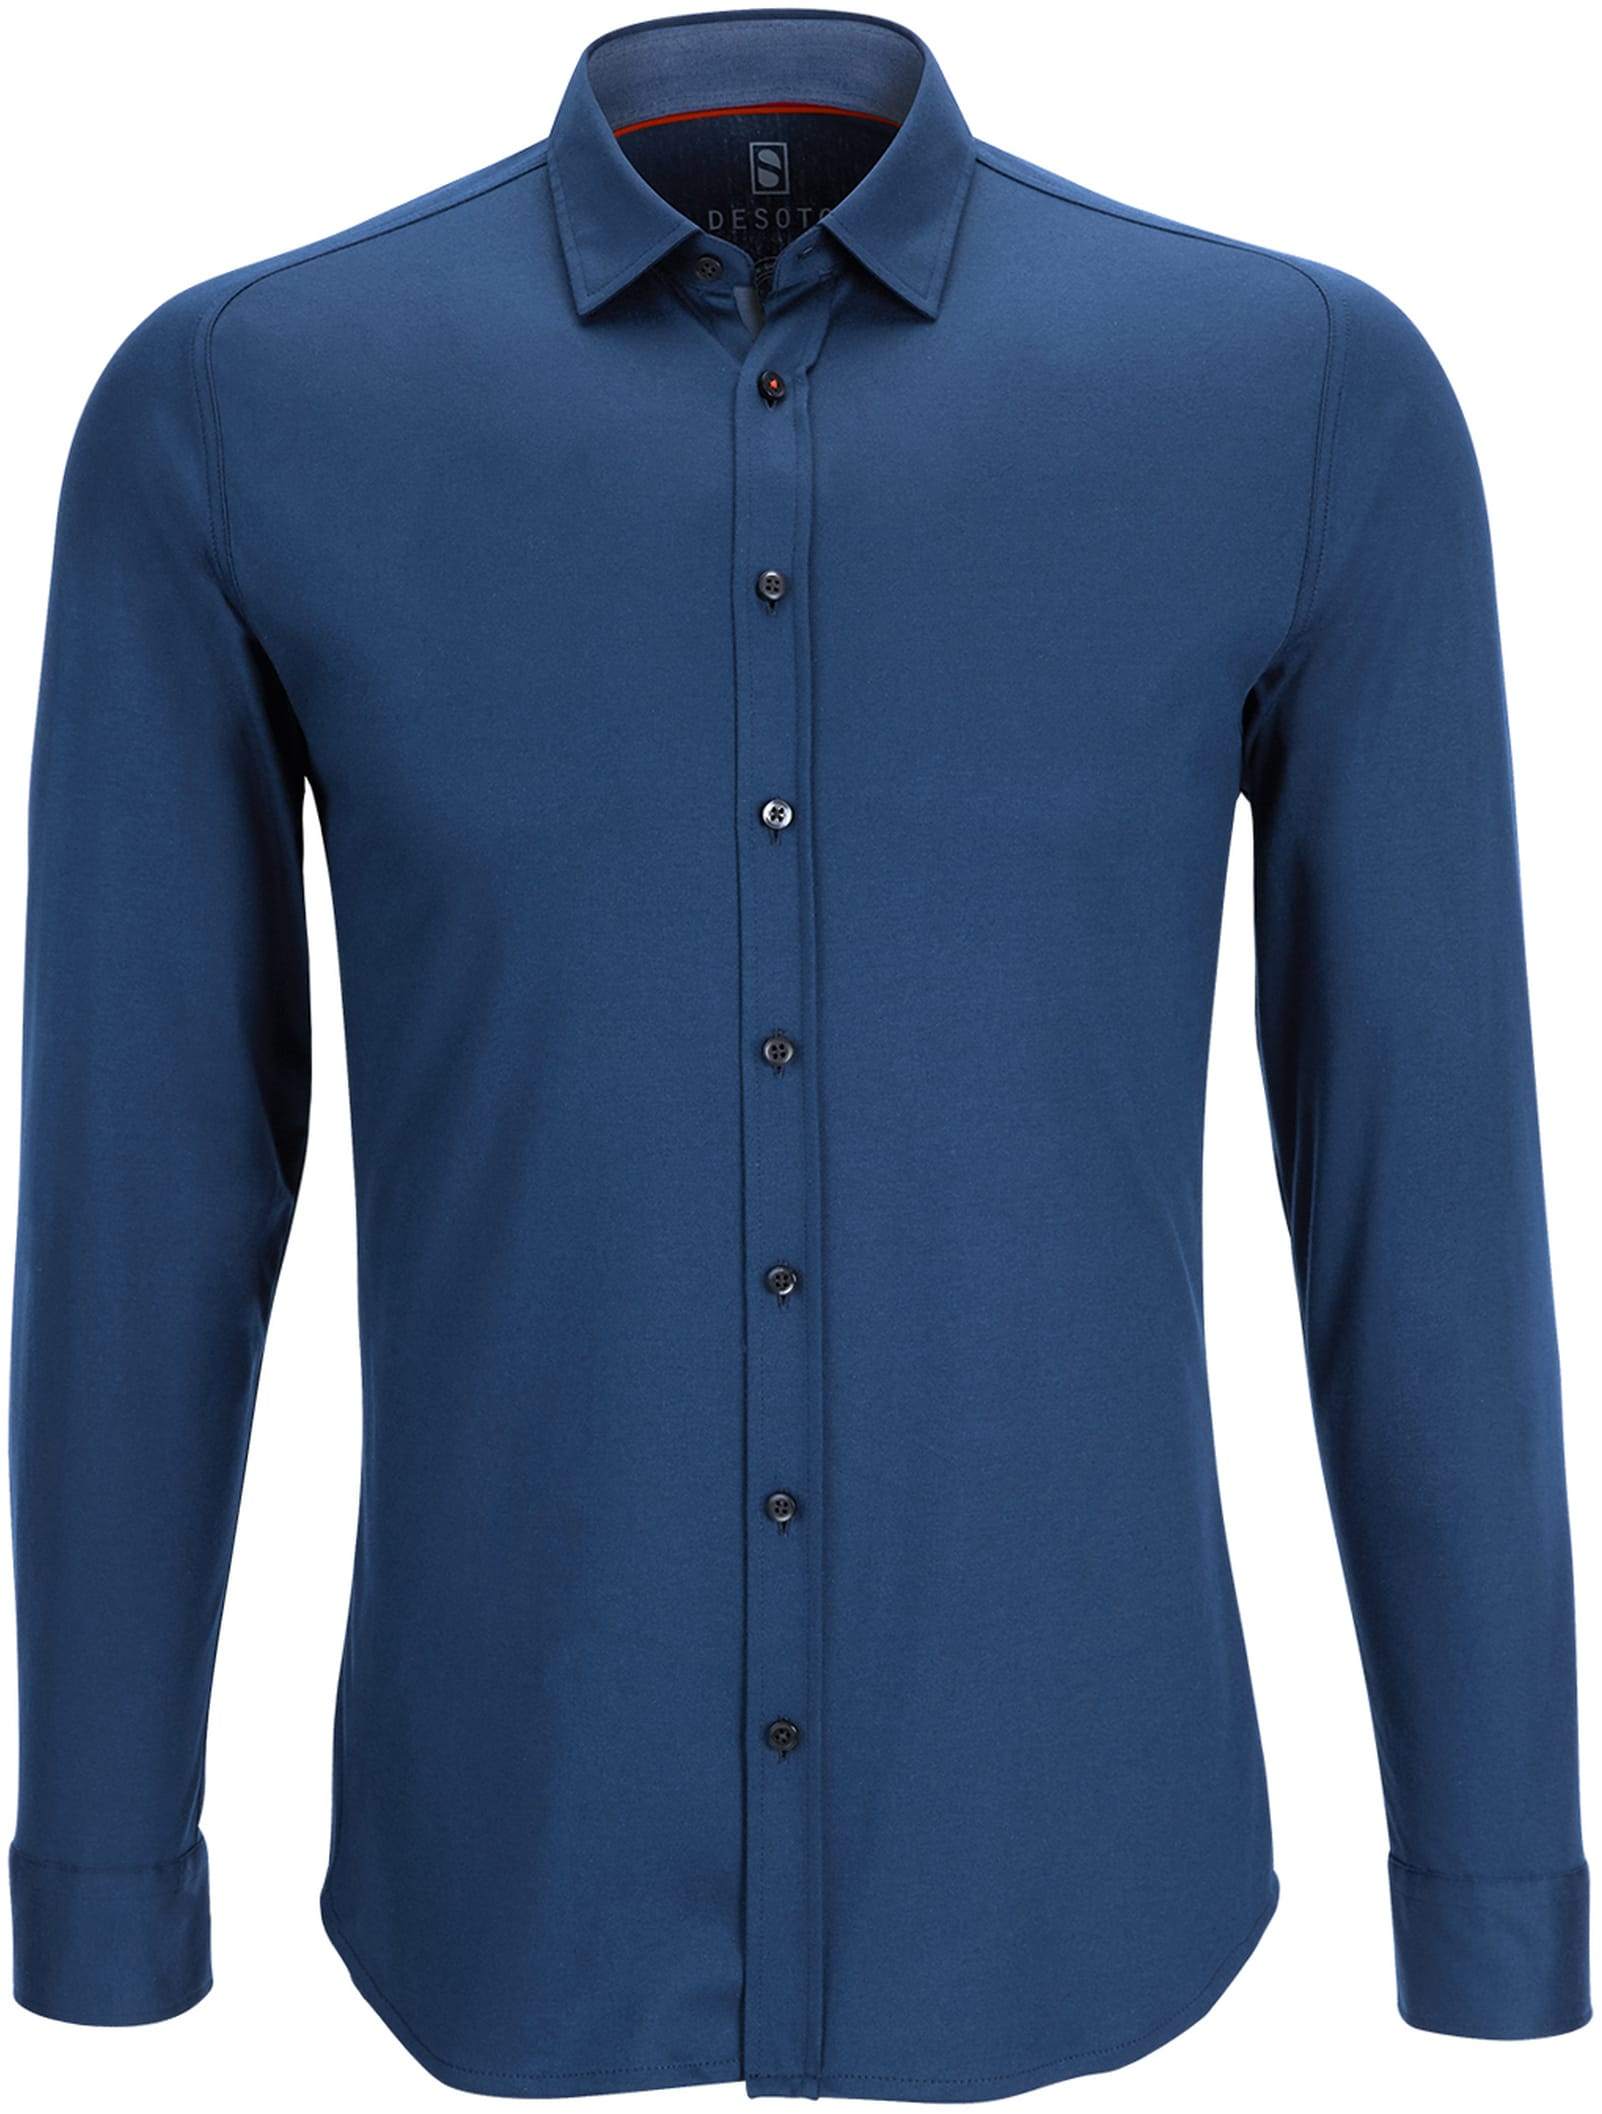 Desoto Overhemd Strijkvrij Indigoblauw foto 0